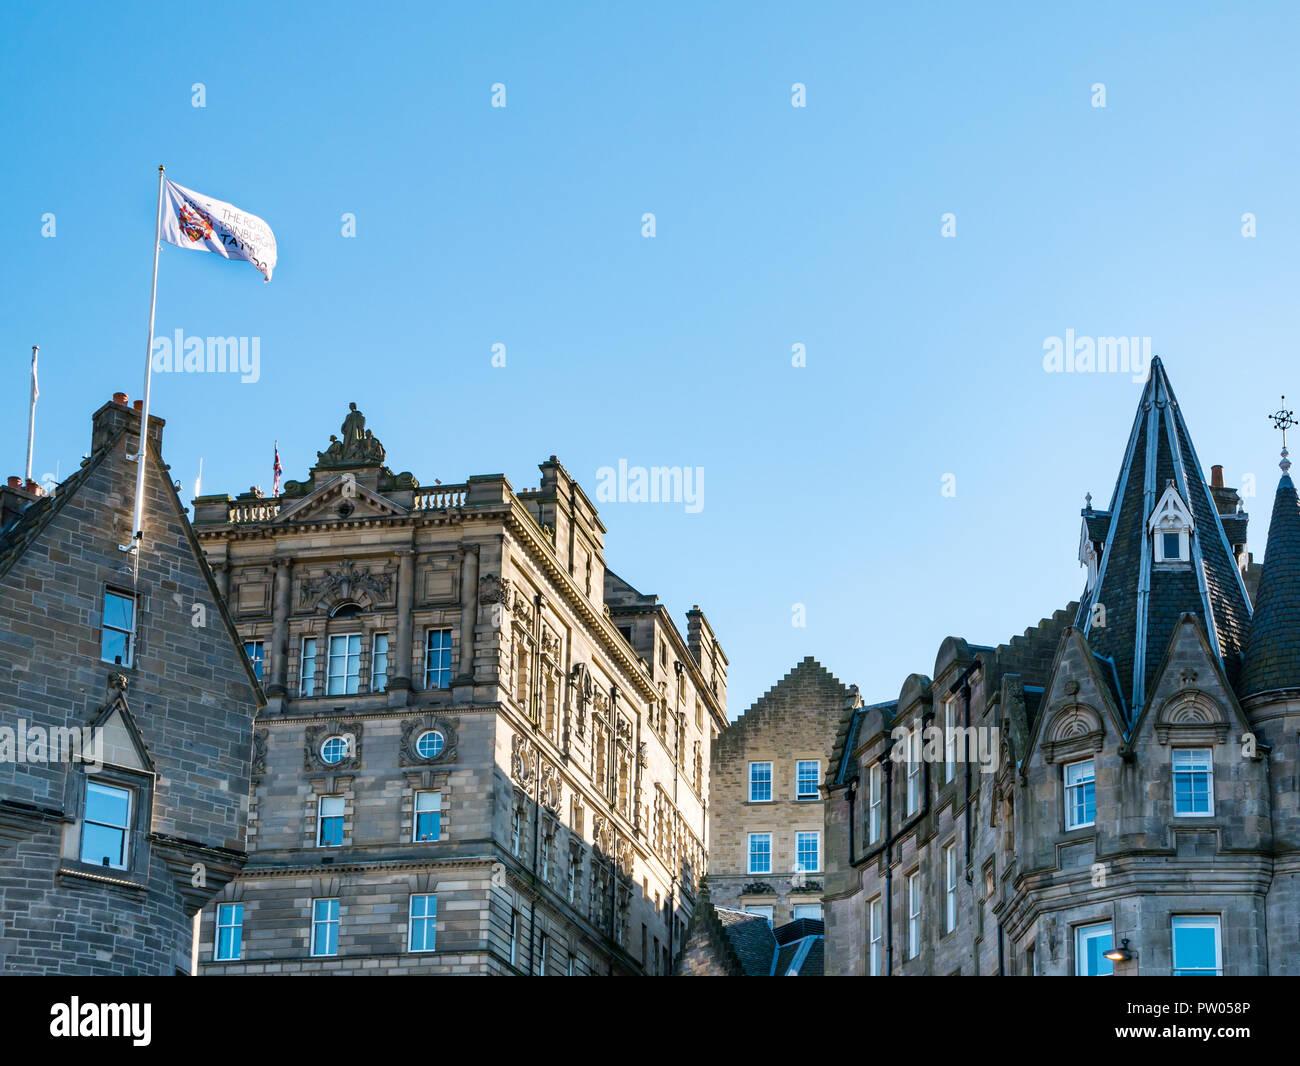 Ornate rooftops of Edinburgh Old Town buildings, Cockburn Street, Edinburgh, Scotland, UK with Military Tattoo flag flying Stock Photo